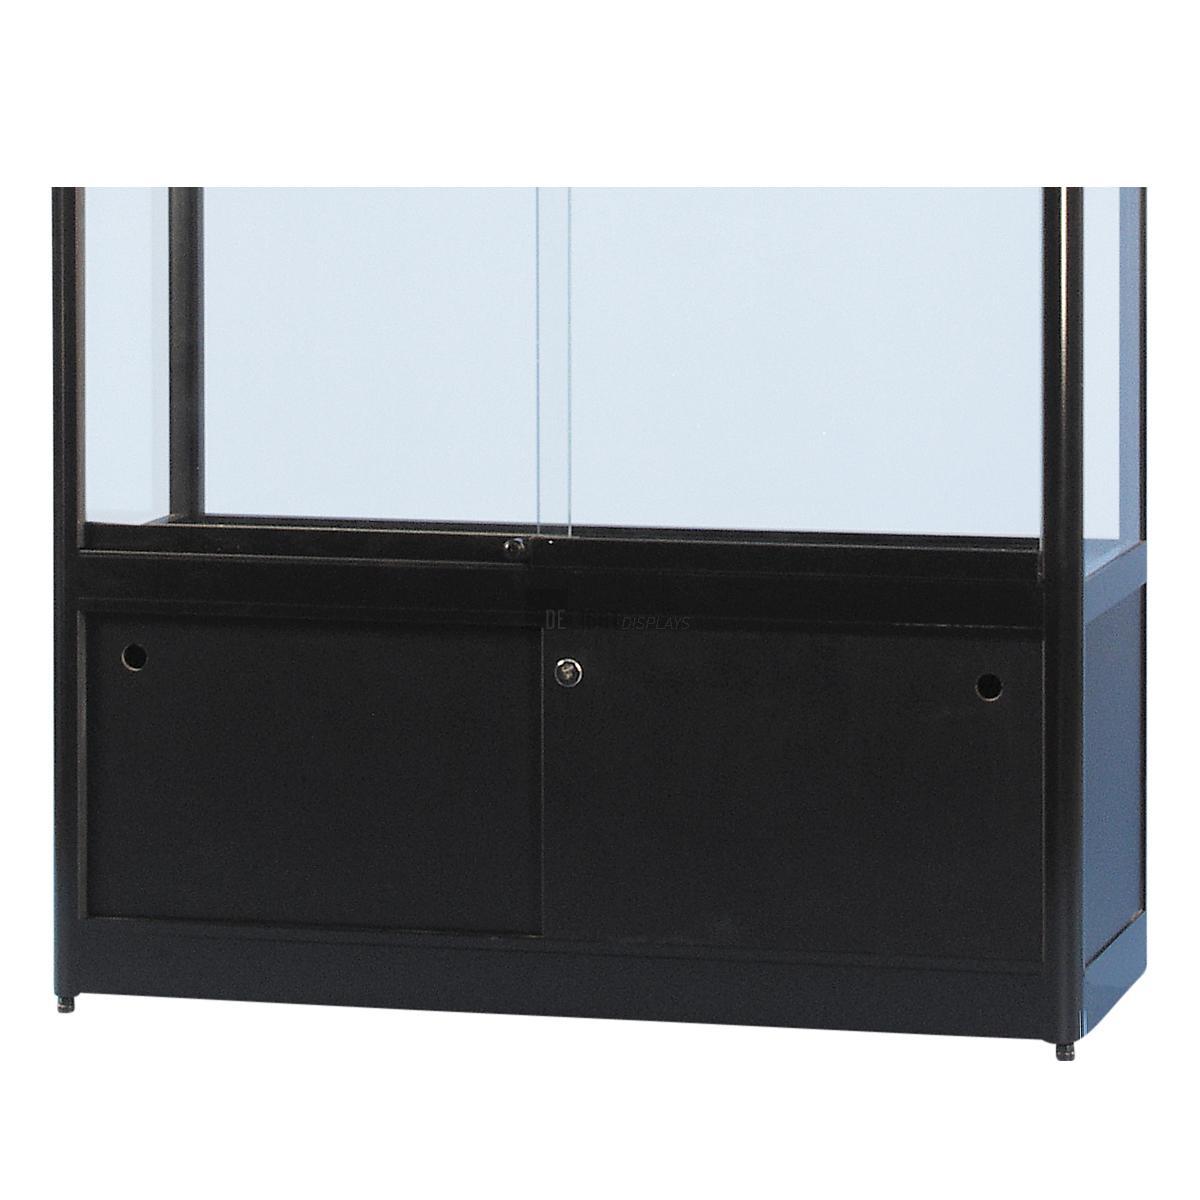 glasvitrine gpc 1000 schwarz unterschrank delight displays. Black Bedroom Furniture Sets. Home Design Ideas